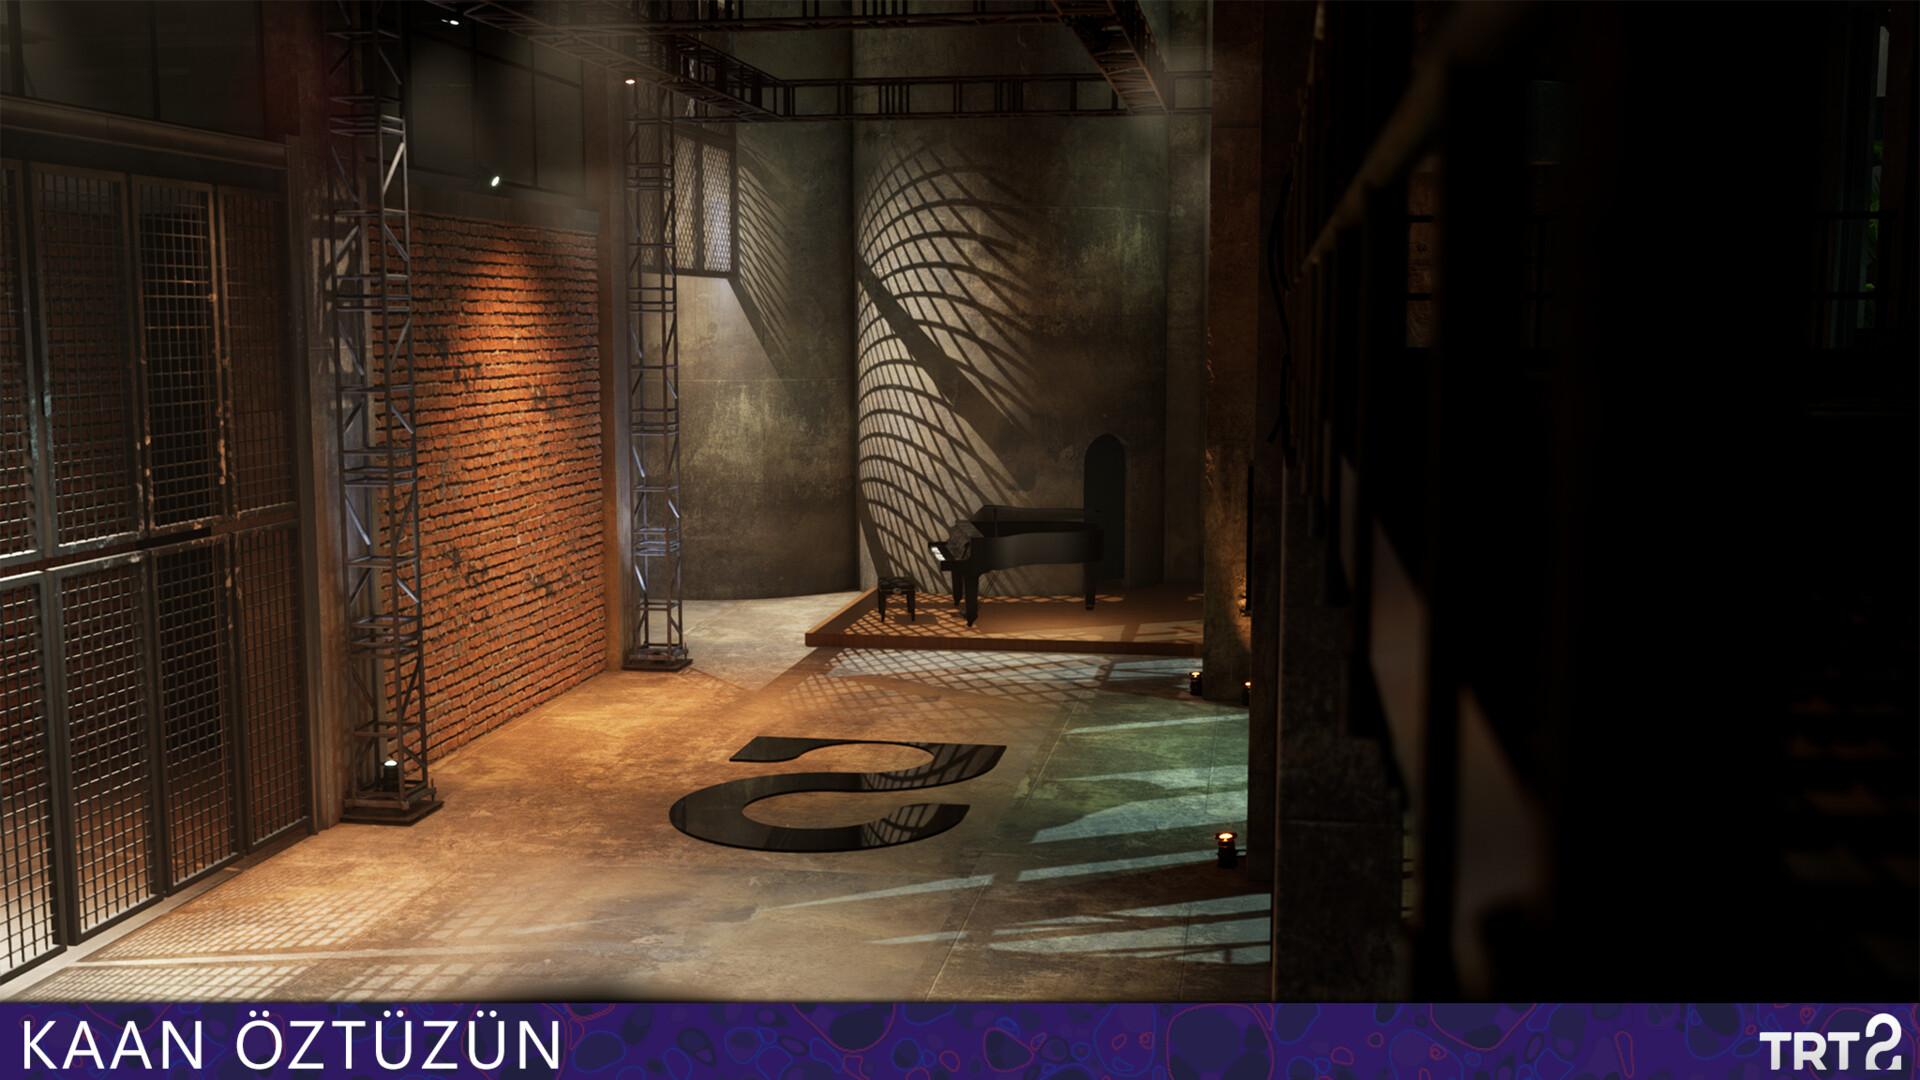 kaan-oztuzun-trt2-factory-kaanoztuzun-03-artstation.jpg